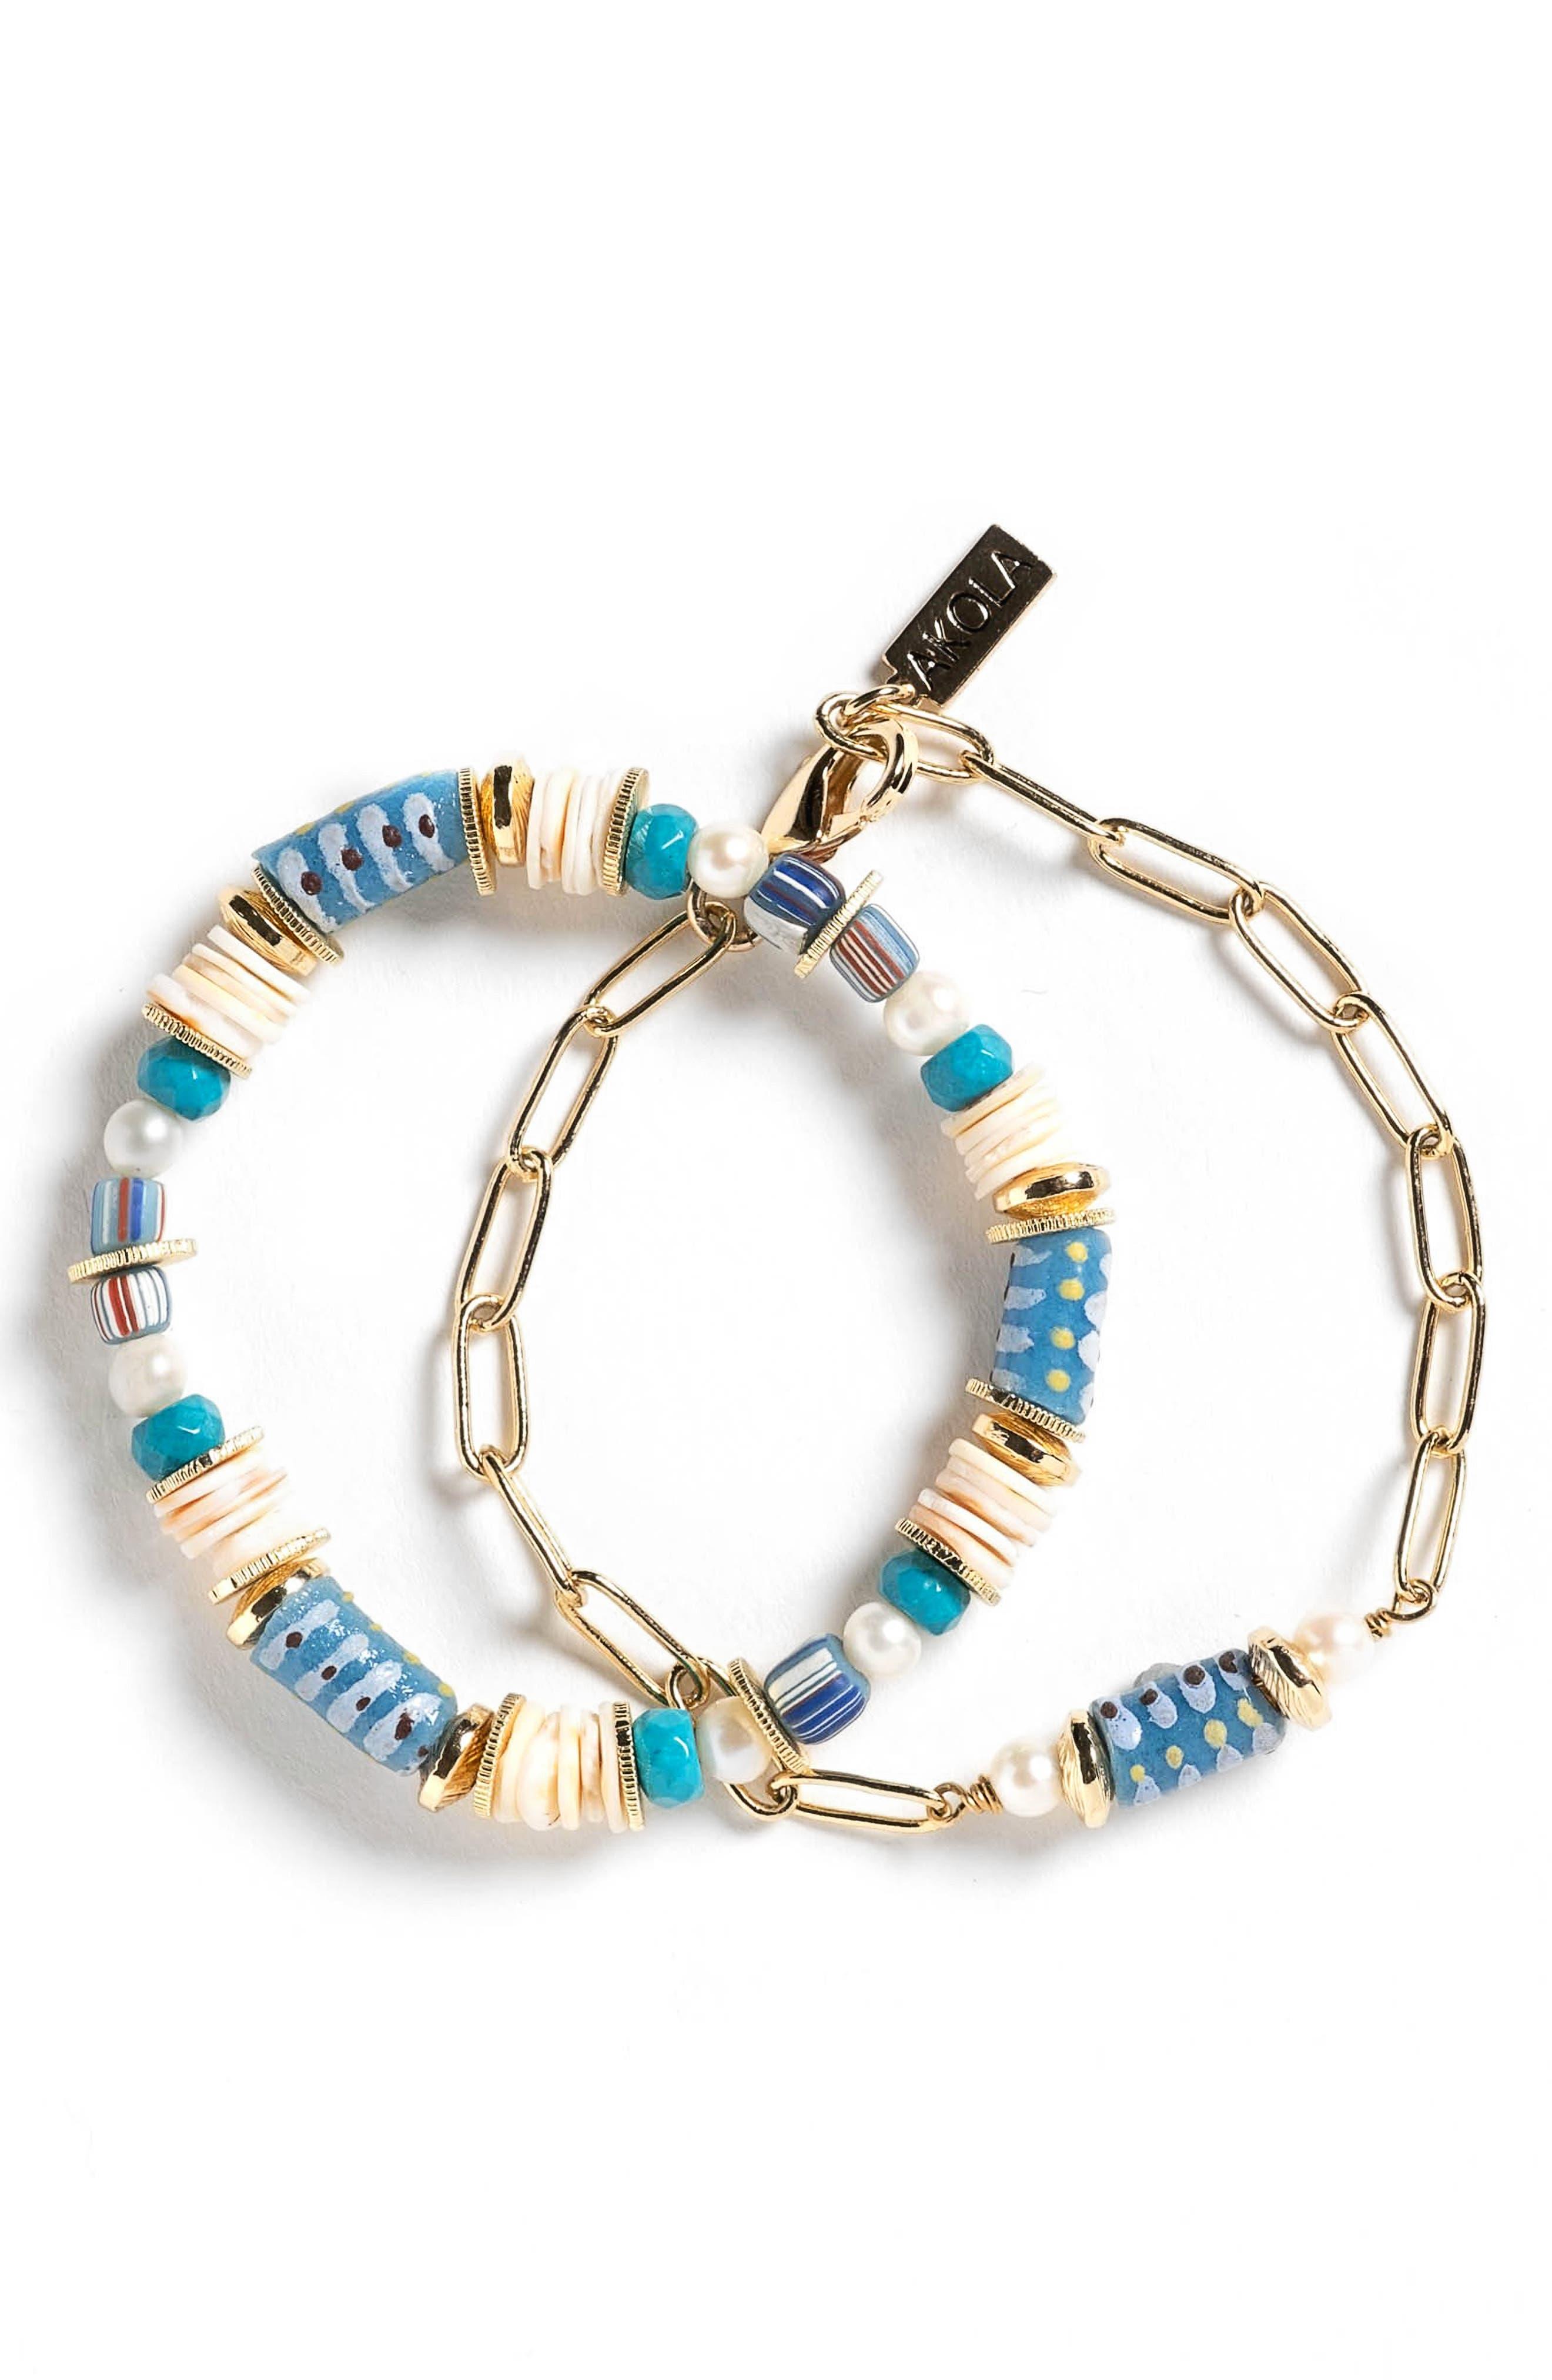 Lori Set Of 2 Chain Link & Beaded Bracelets